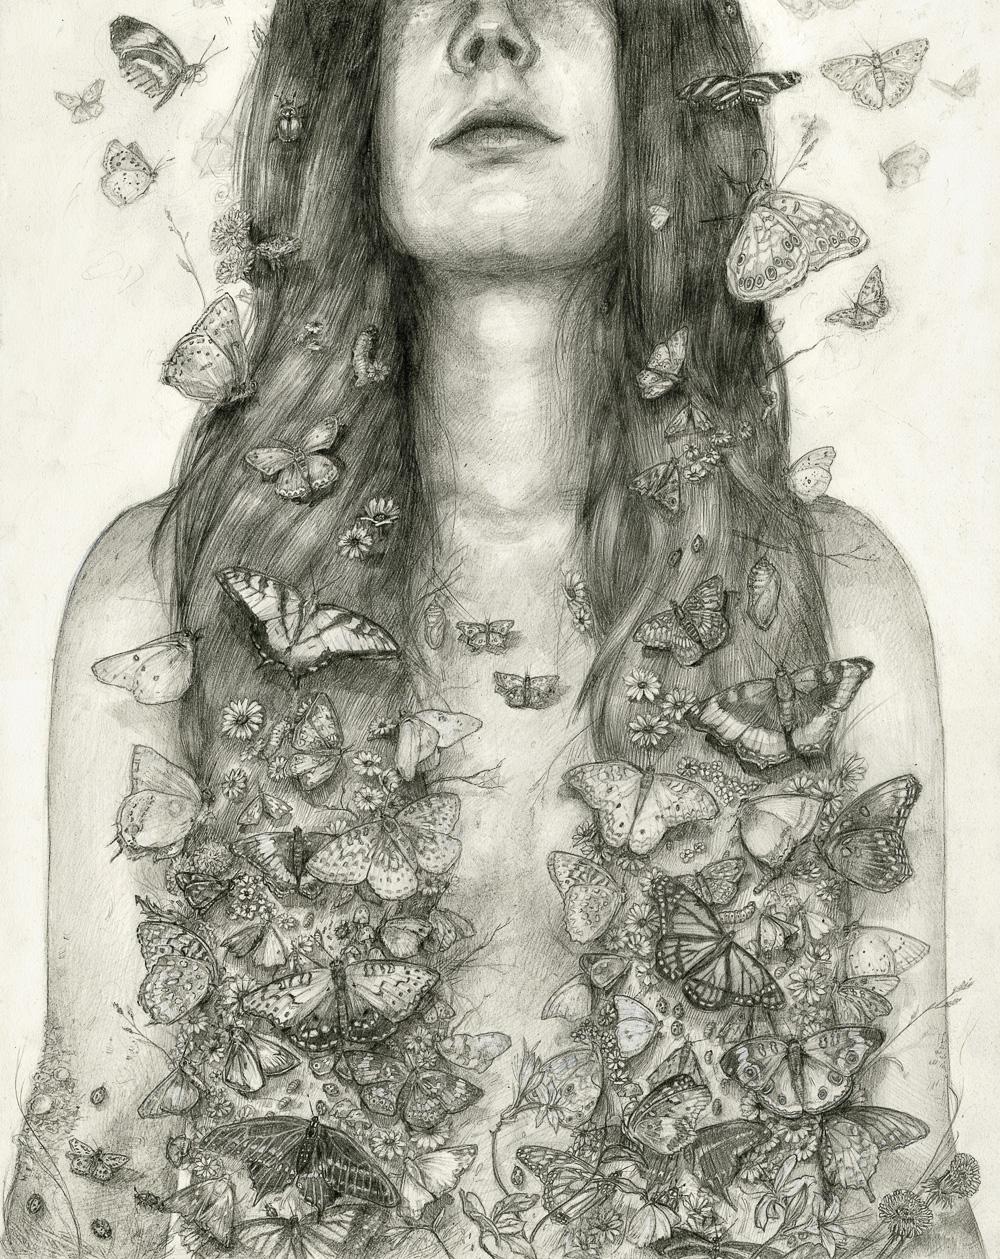 T. Dylan Moore - Atlanta, GA artist